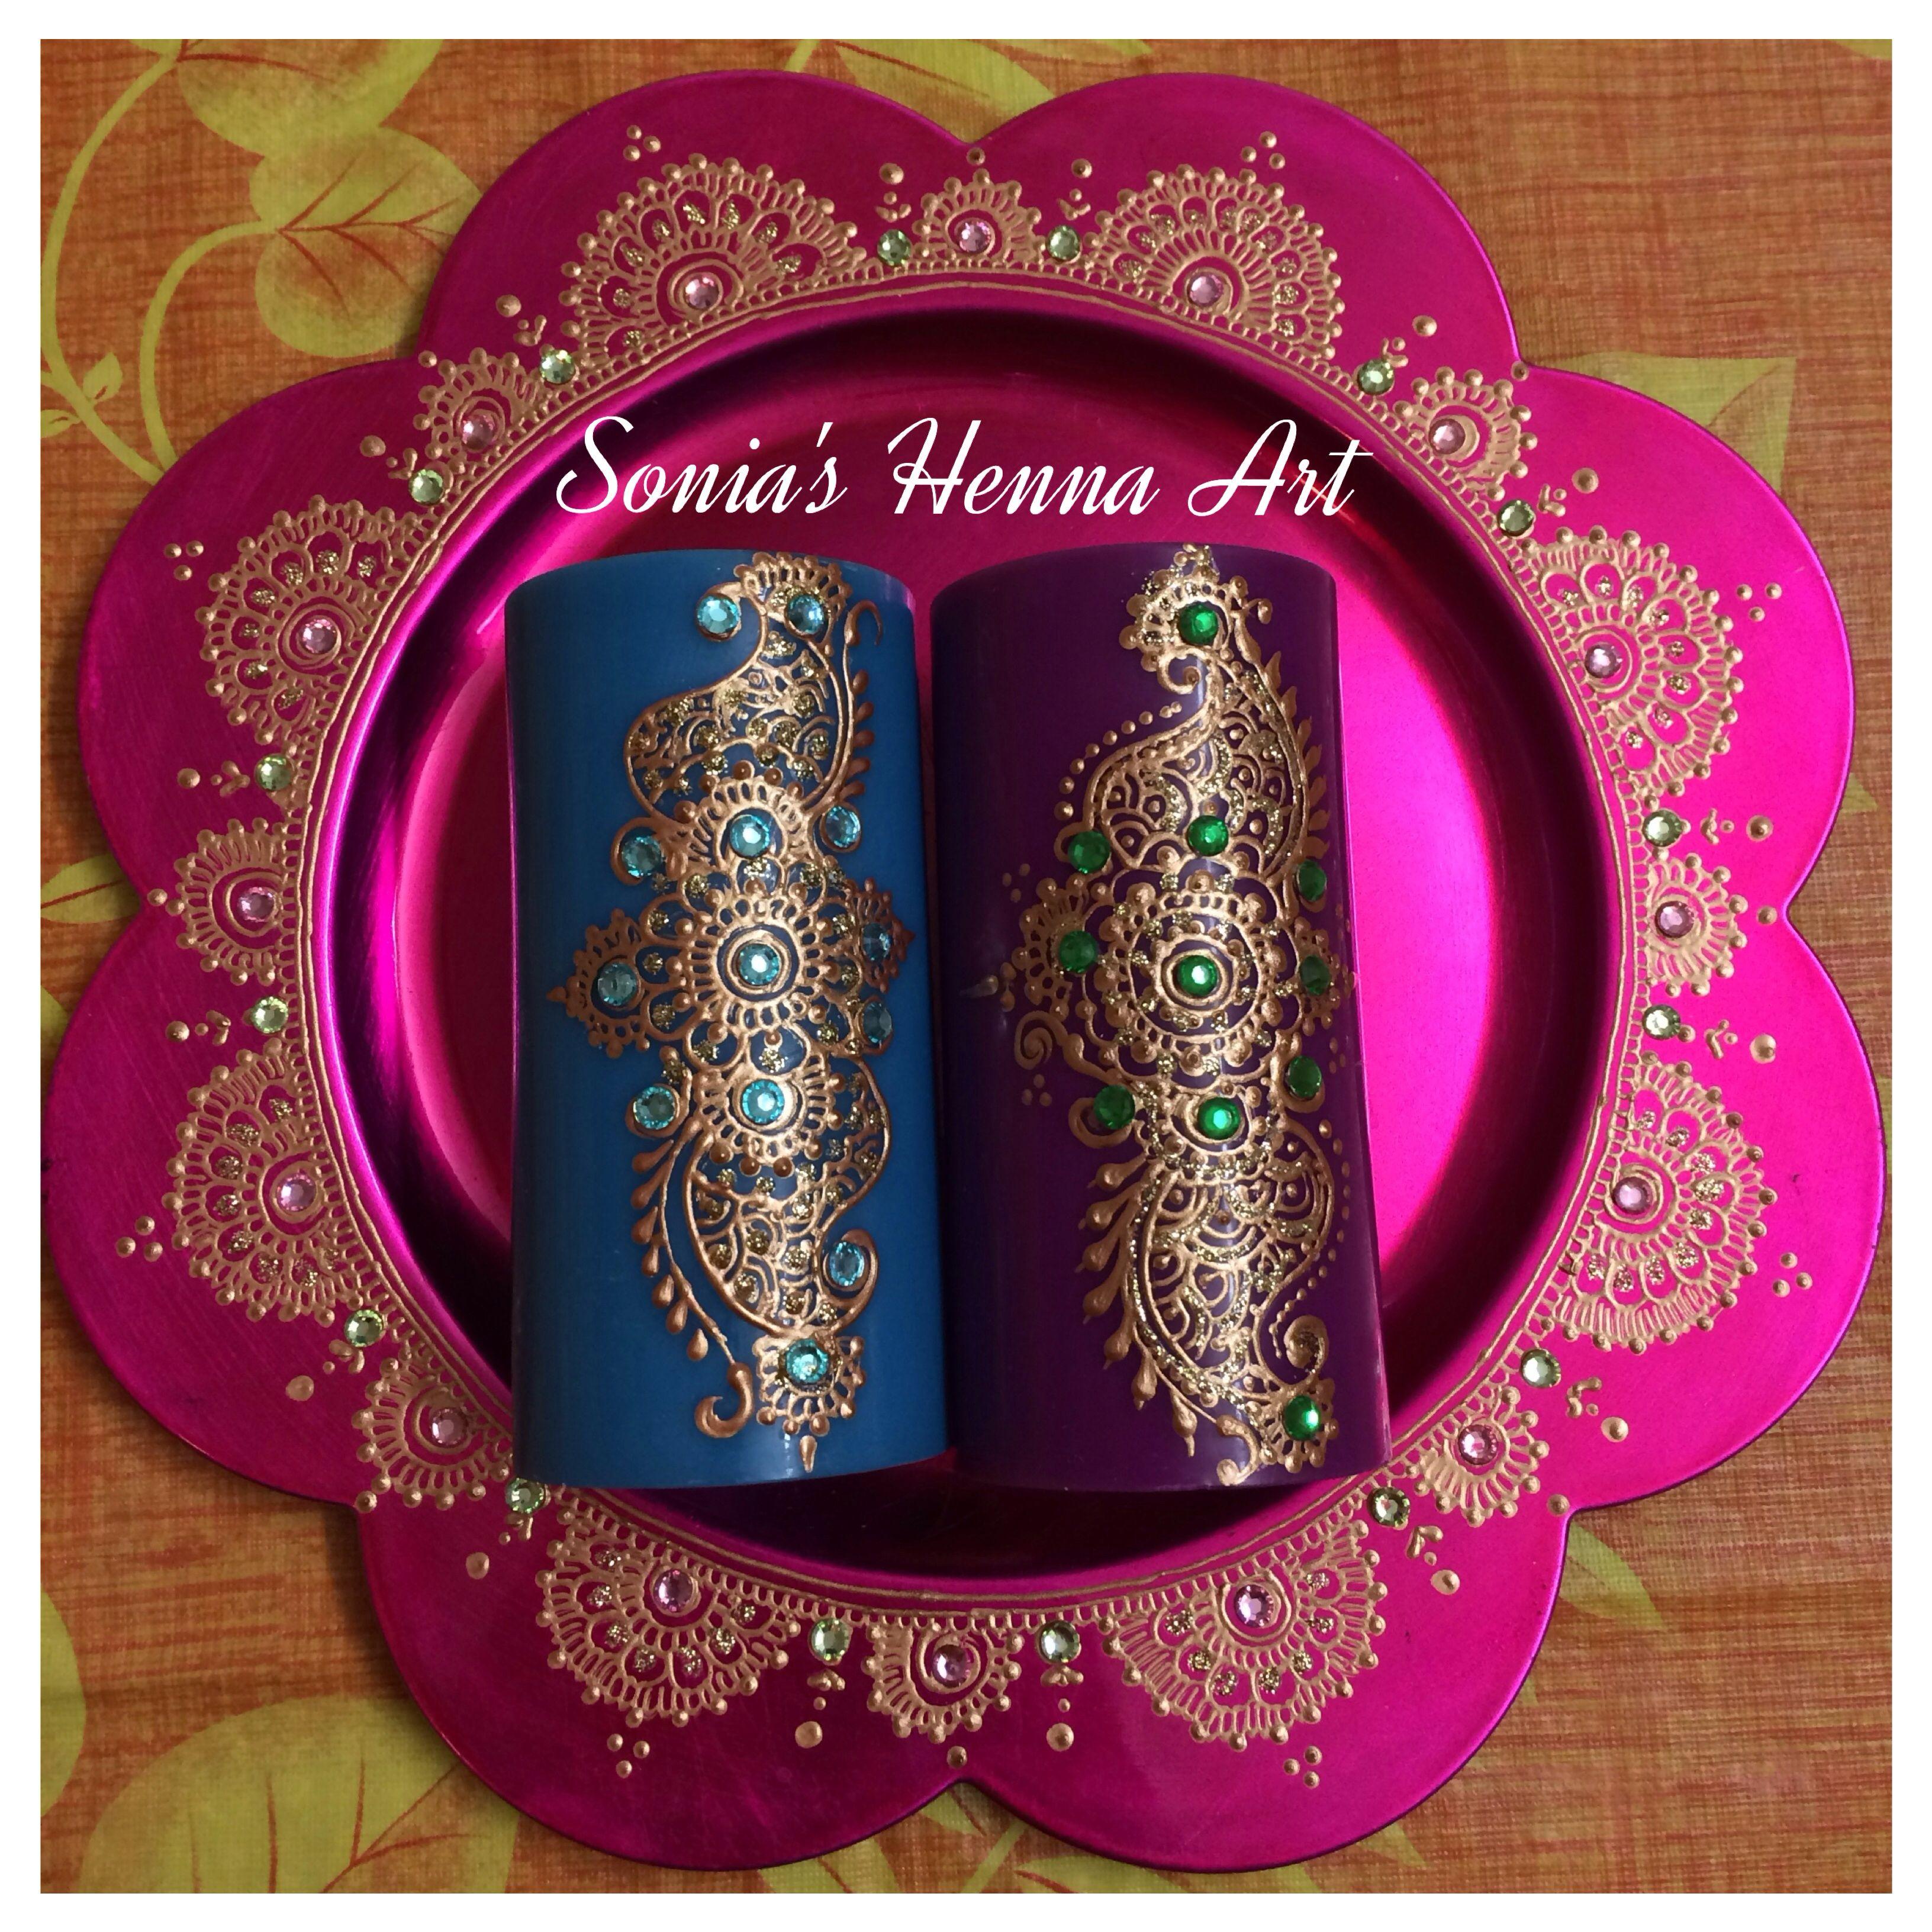 Diy Mehndi Plates : Hand crafts mehndi unique decor idea henna candle